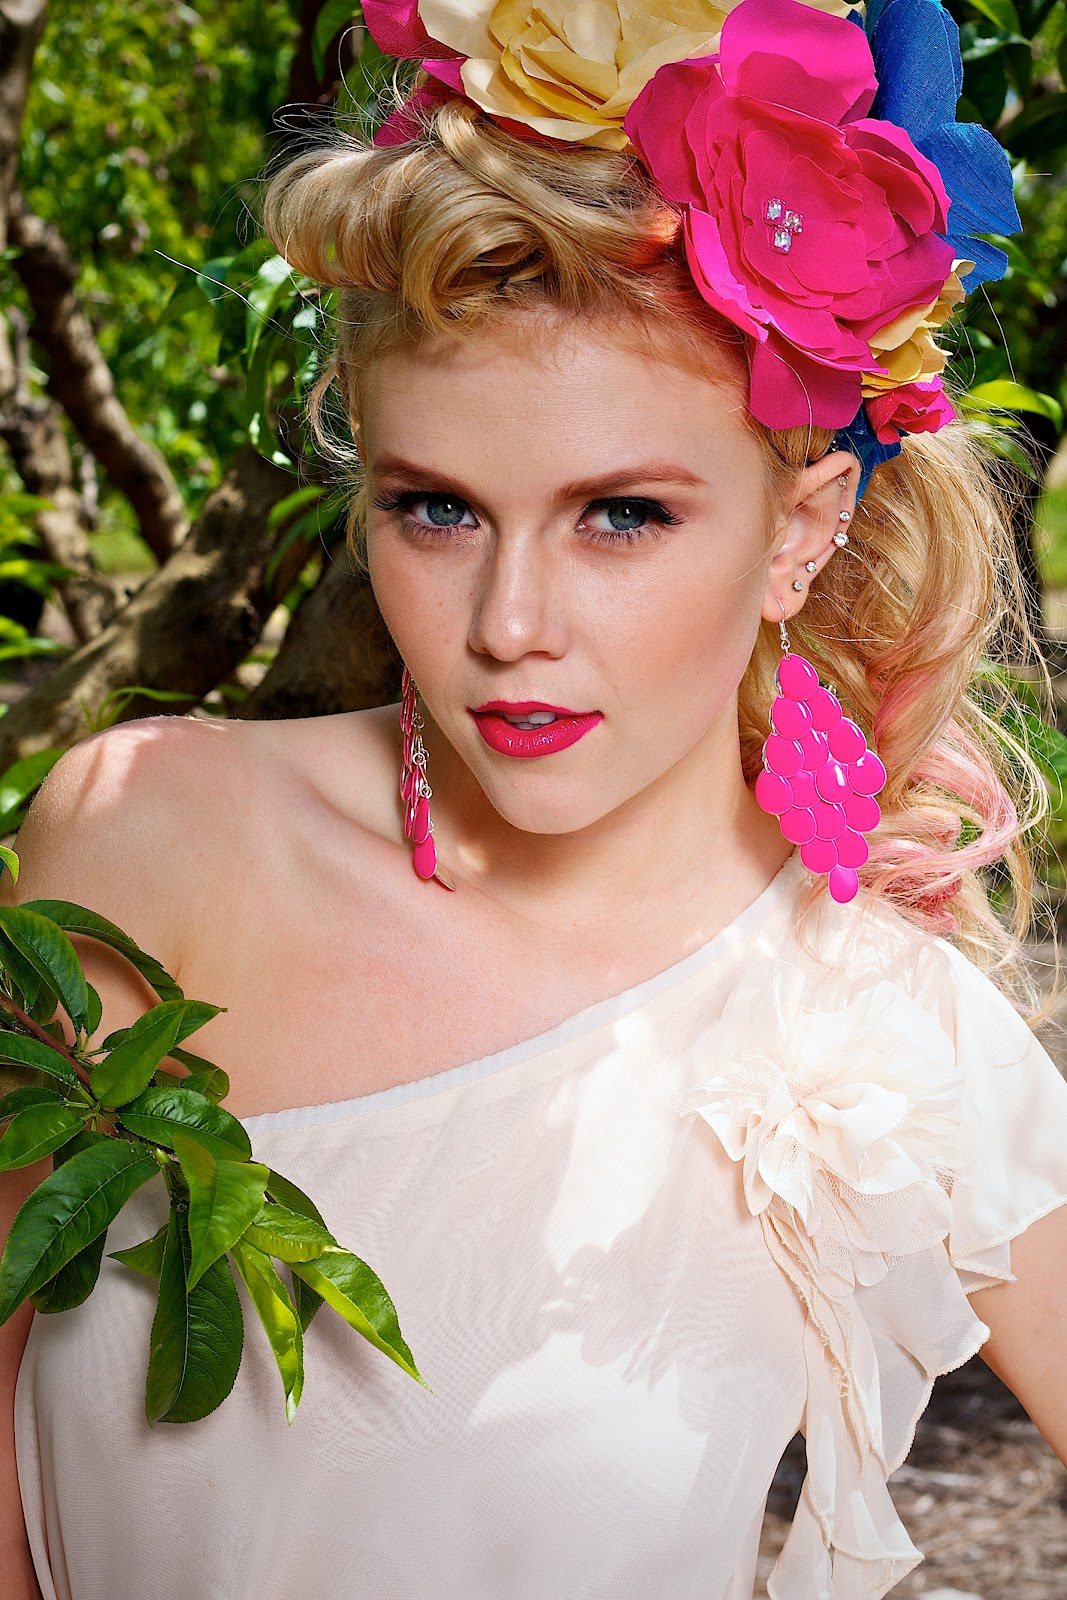 ls models pleasure Faces of Spring: Part 2